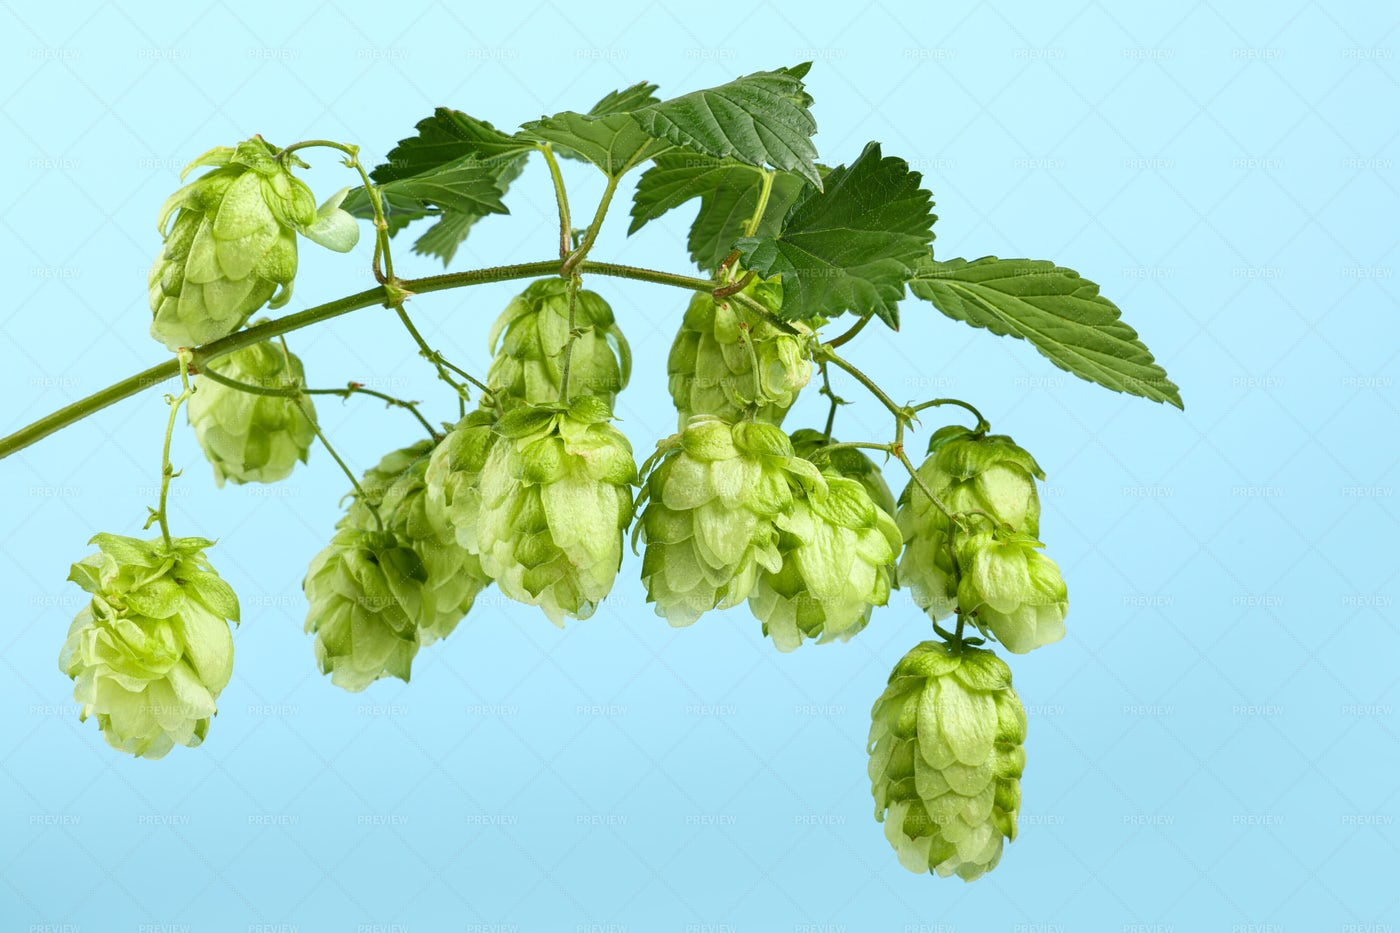 Green Hop Bine Branch: Stock Photos